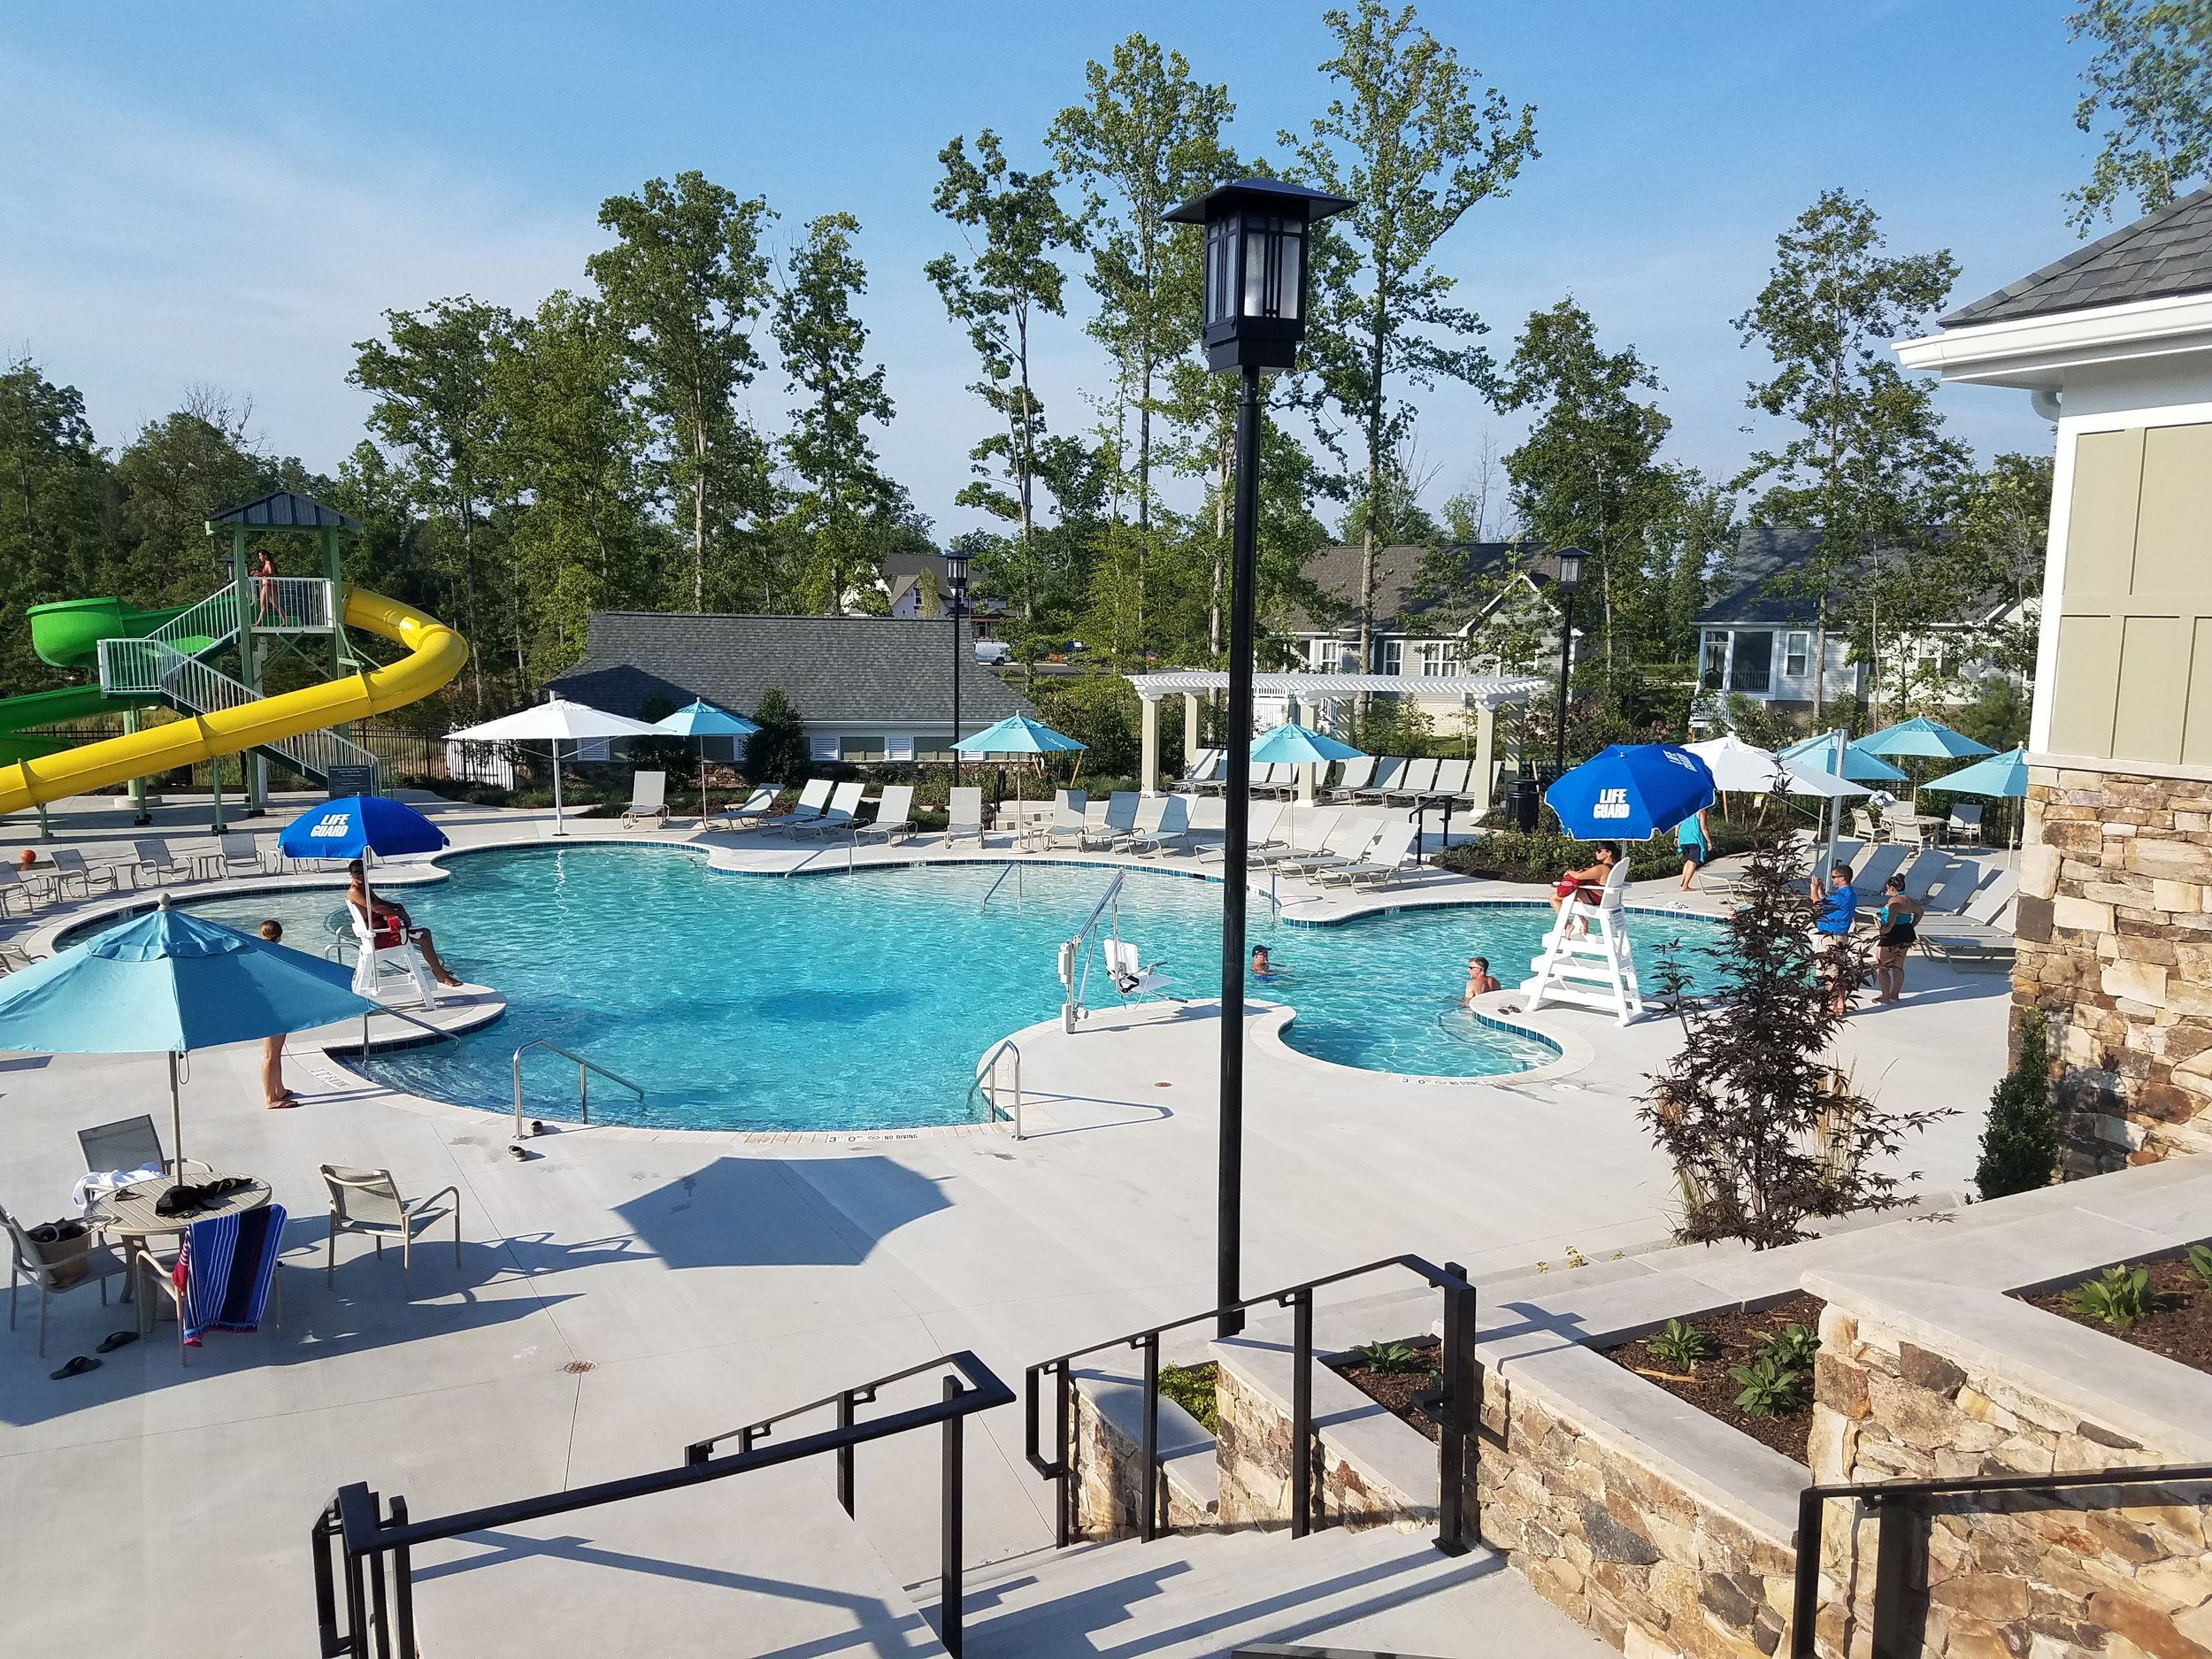 Pool area at the Magnolia Green Aquatic Center in Moseley, VA